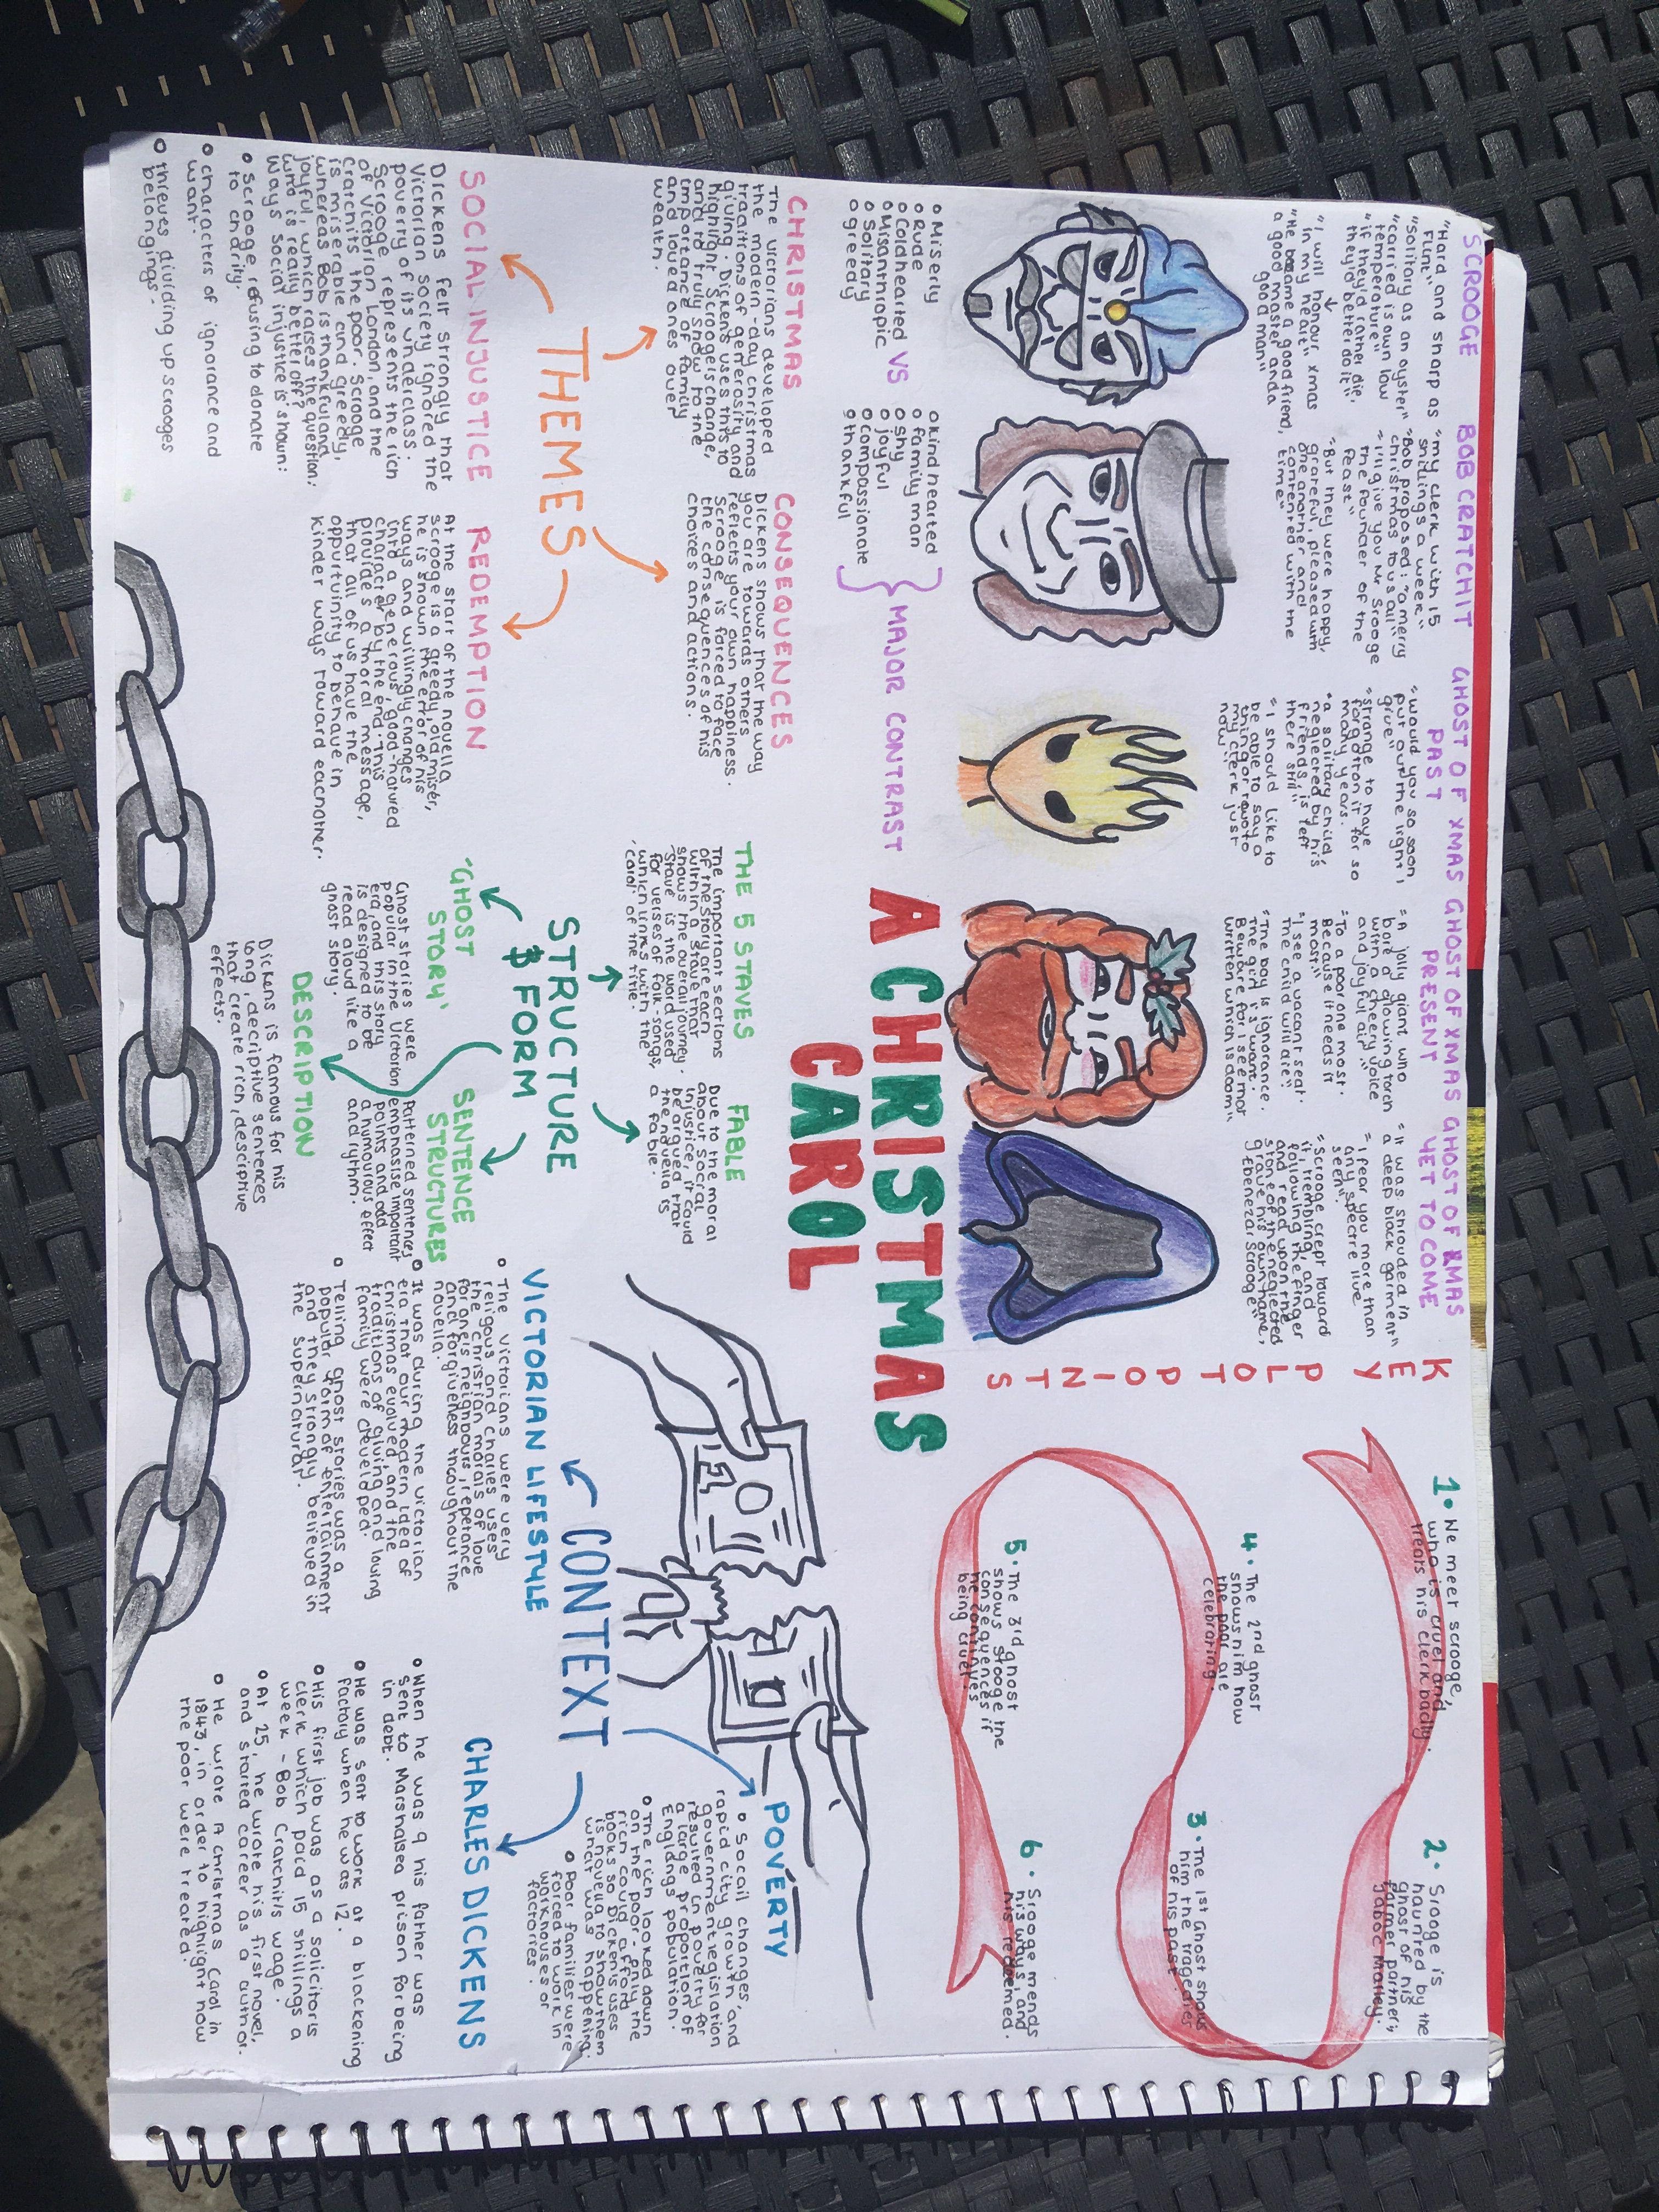 Pin by Adele_Jade on School Help | A christmas carol revision, Gcse english, Christmas carol ...